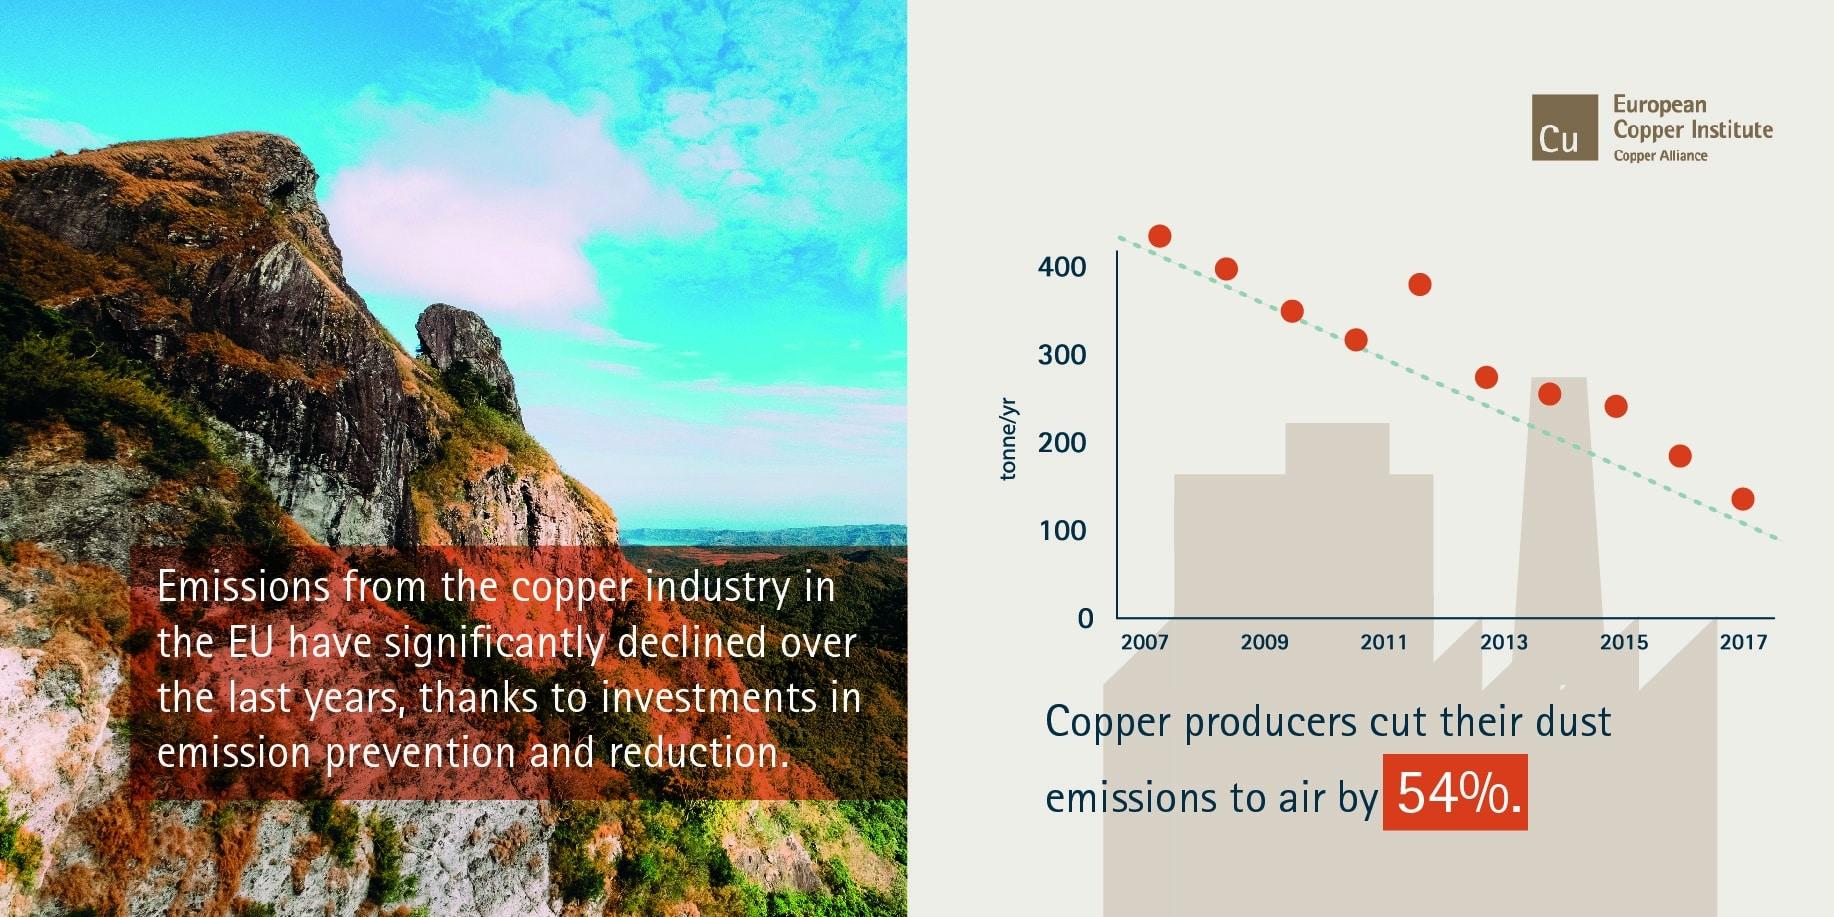 eci-dust-emissions-infographic_final